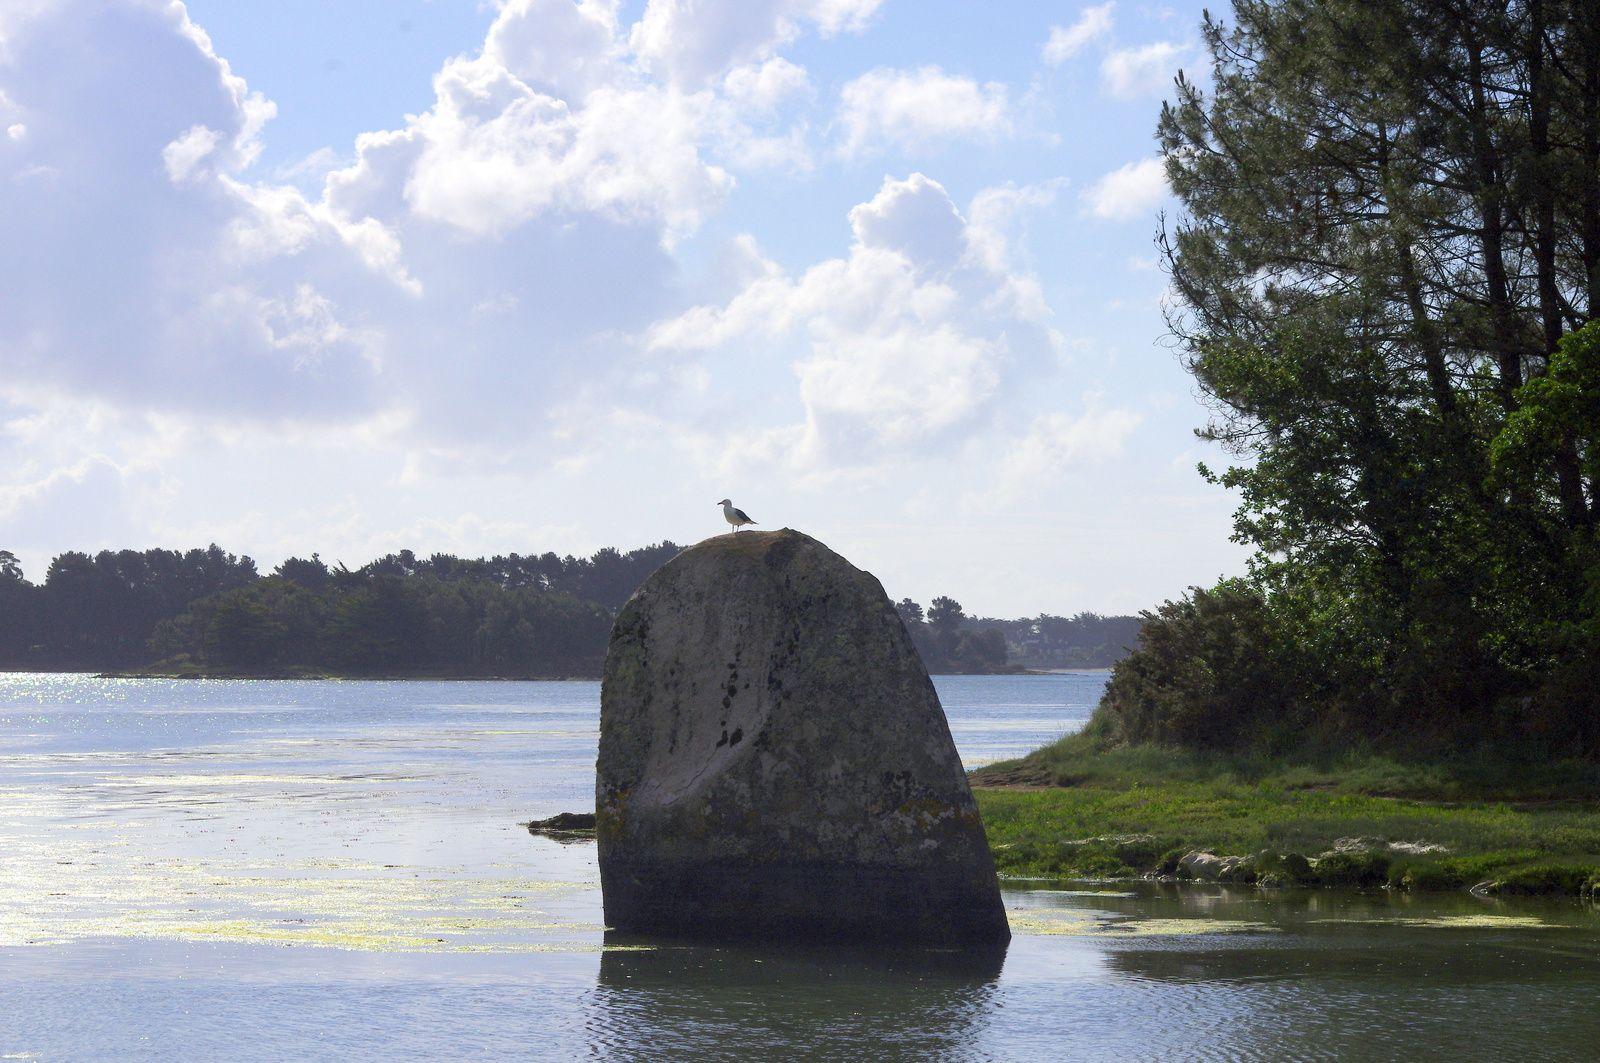 LOCTUDY - Menhir de PENGLAOUIC - accès